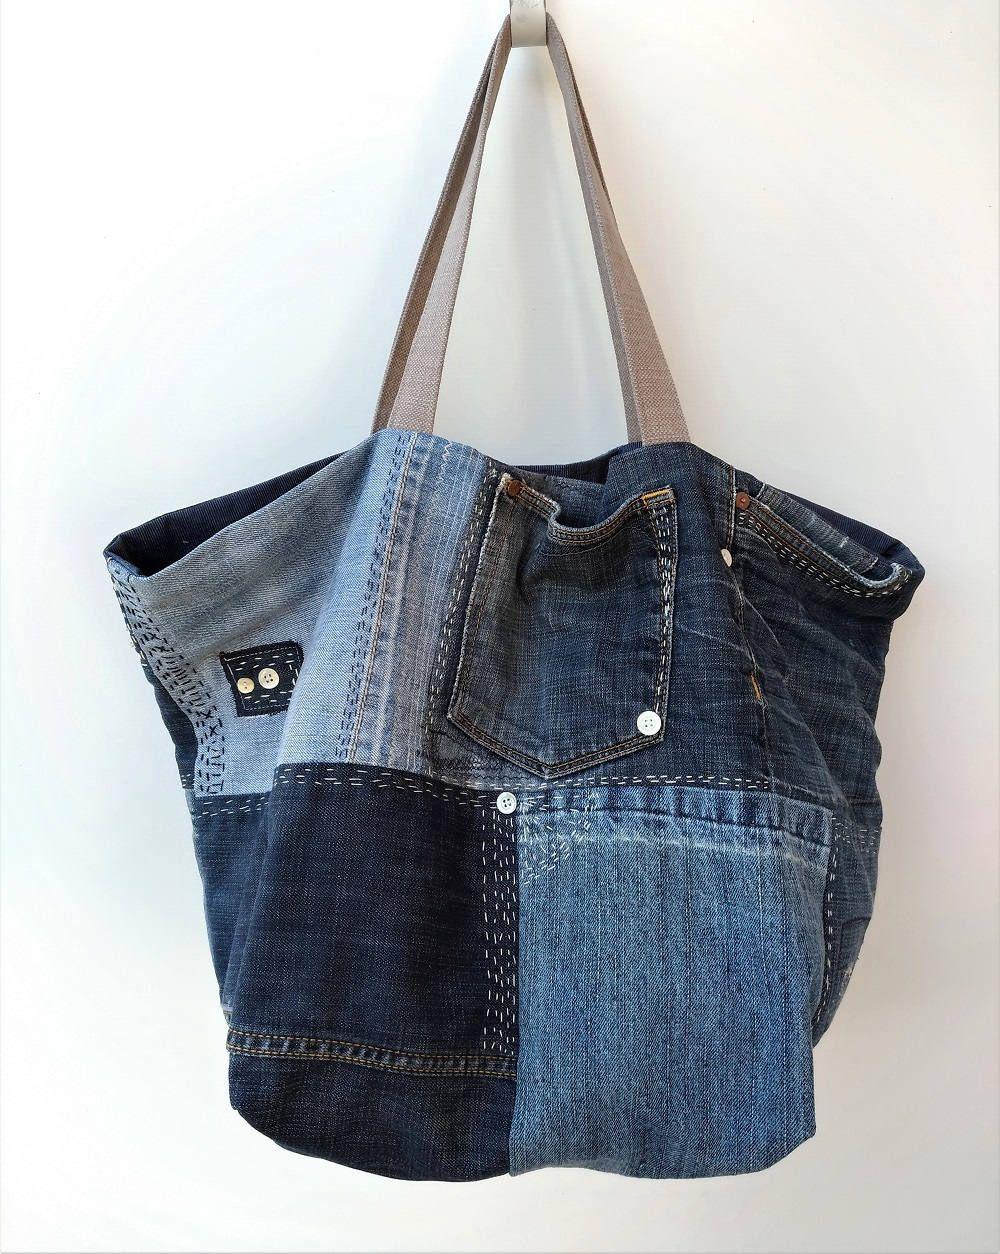 VIDA Tote Bag - lovestruck by VIDA vHLDx